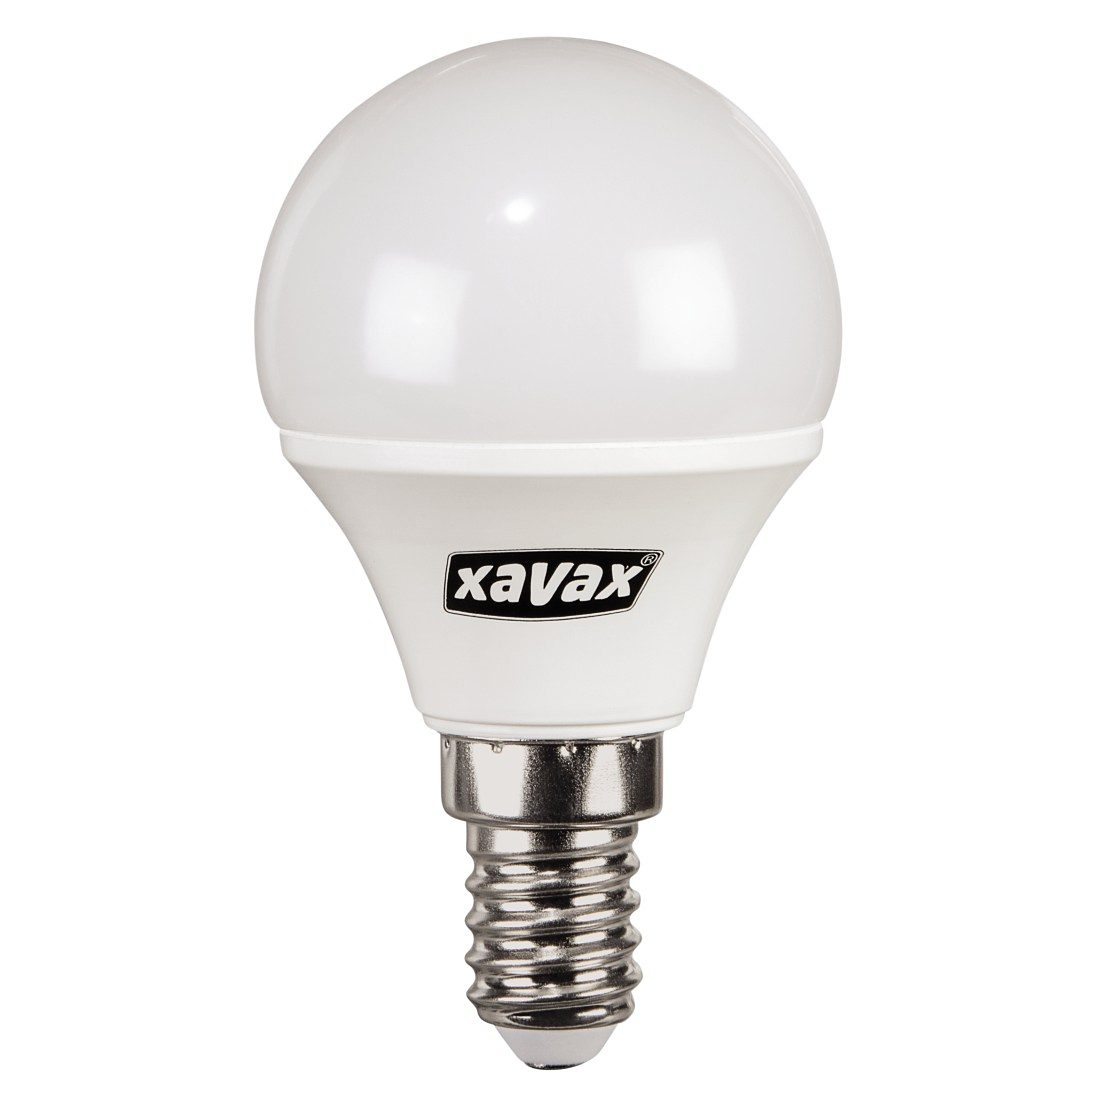 Xavax LED-Lampe, 4,5W, Tropfenform, E14, Warmweiß